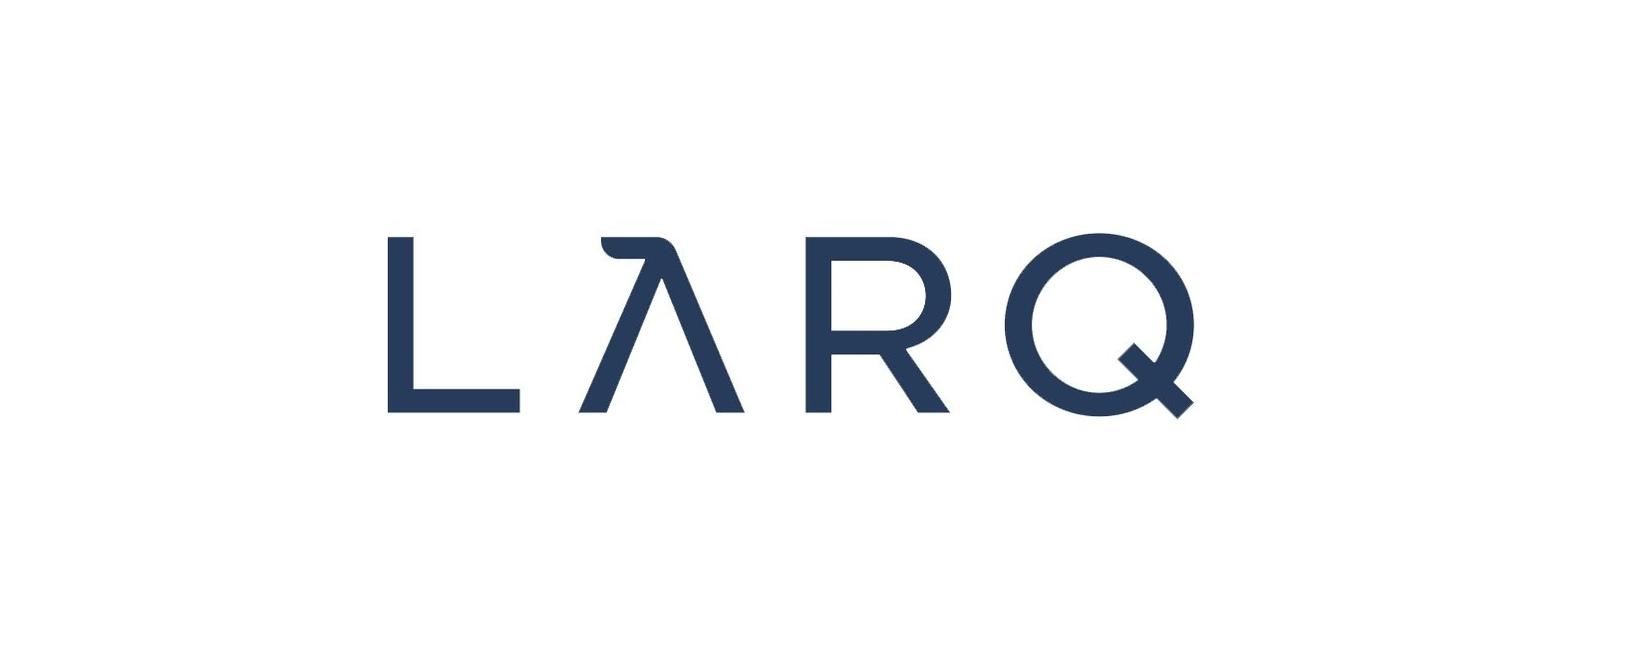 LARQ Discount Code 2021